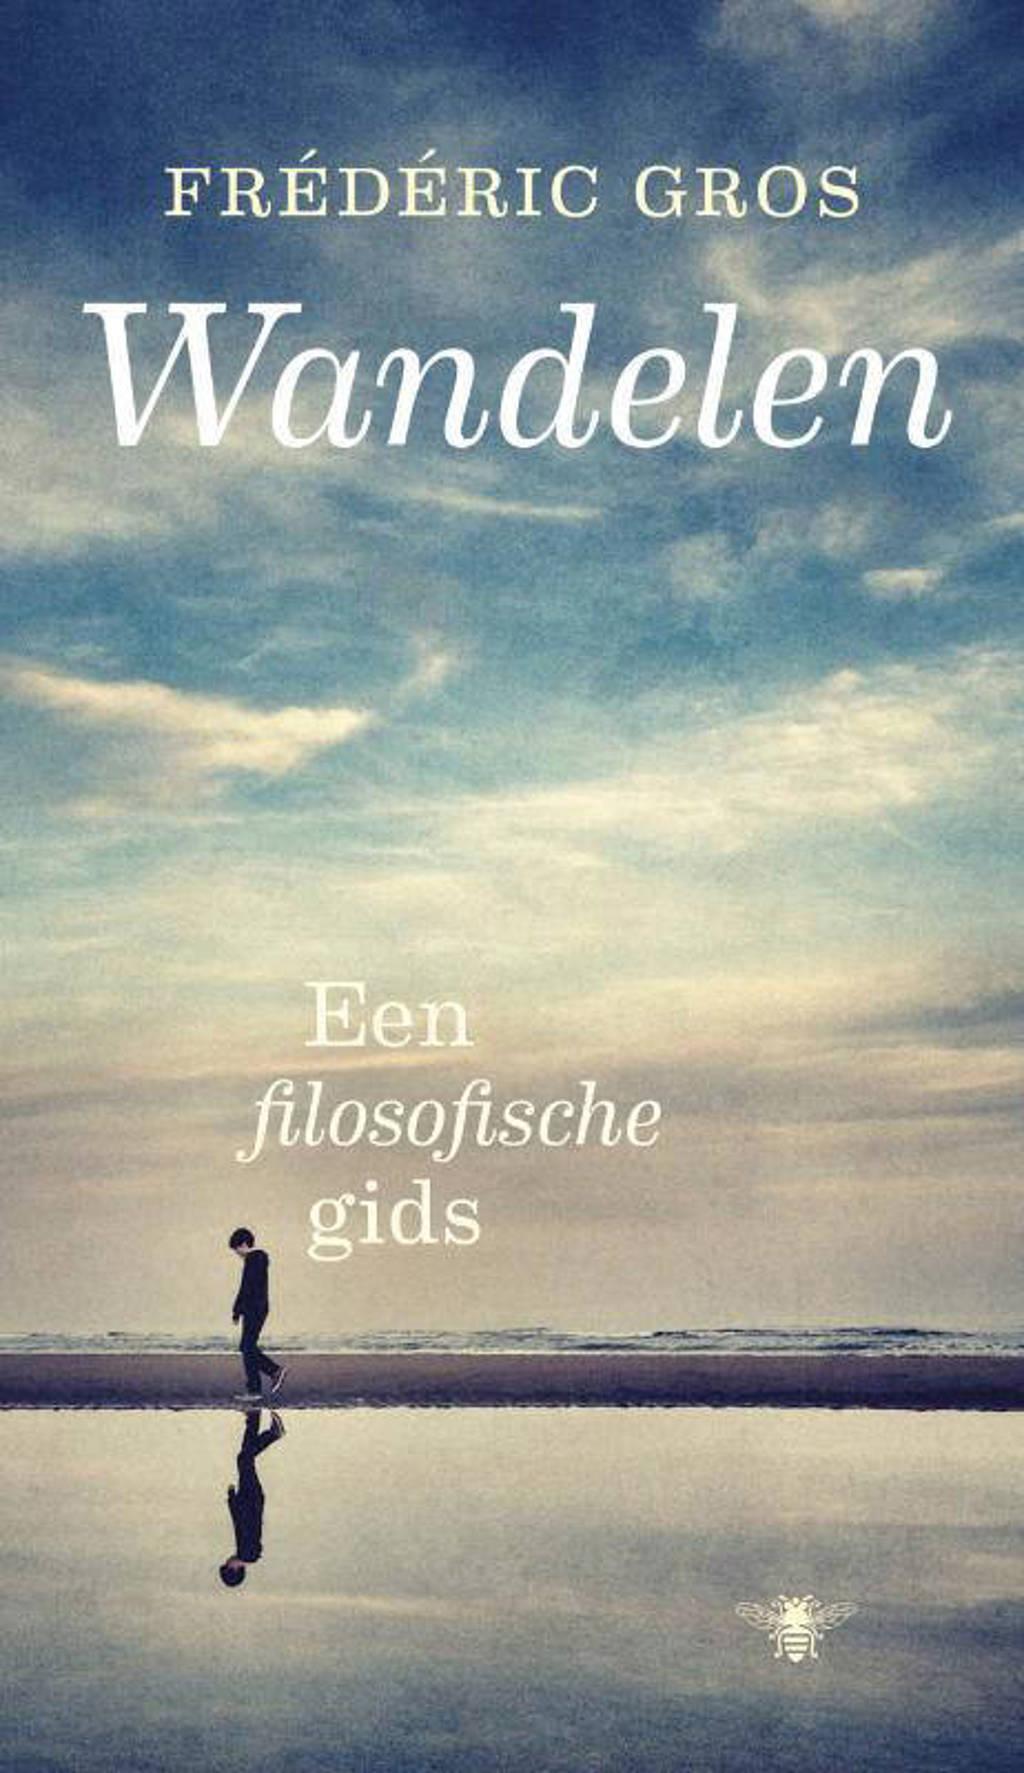 Wandelen - Frederic Gros